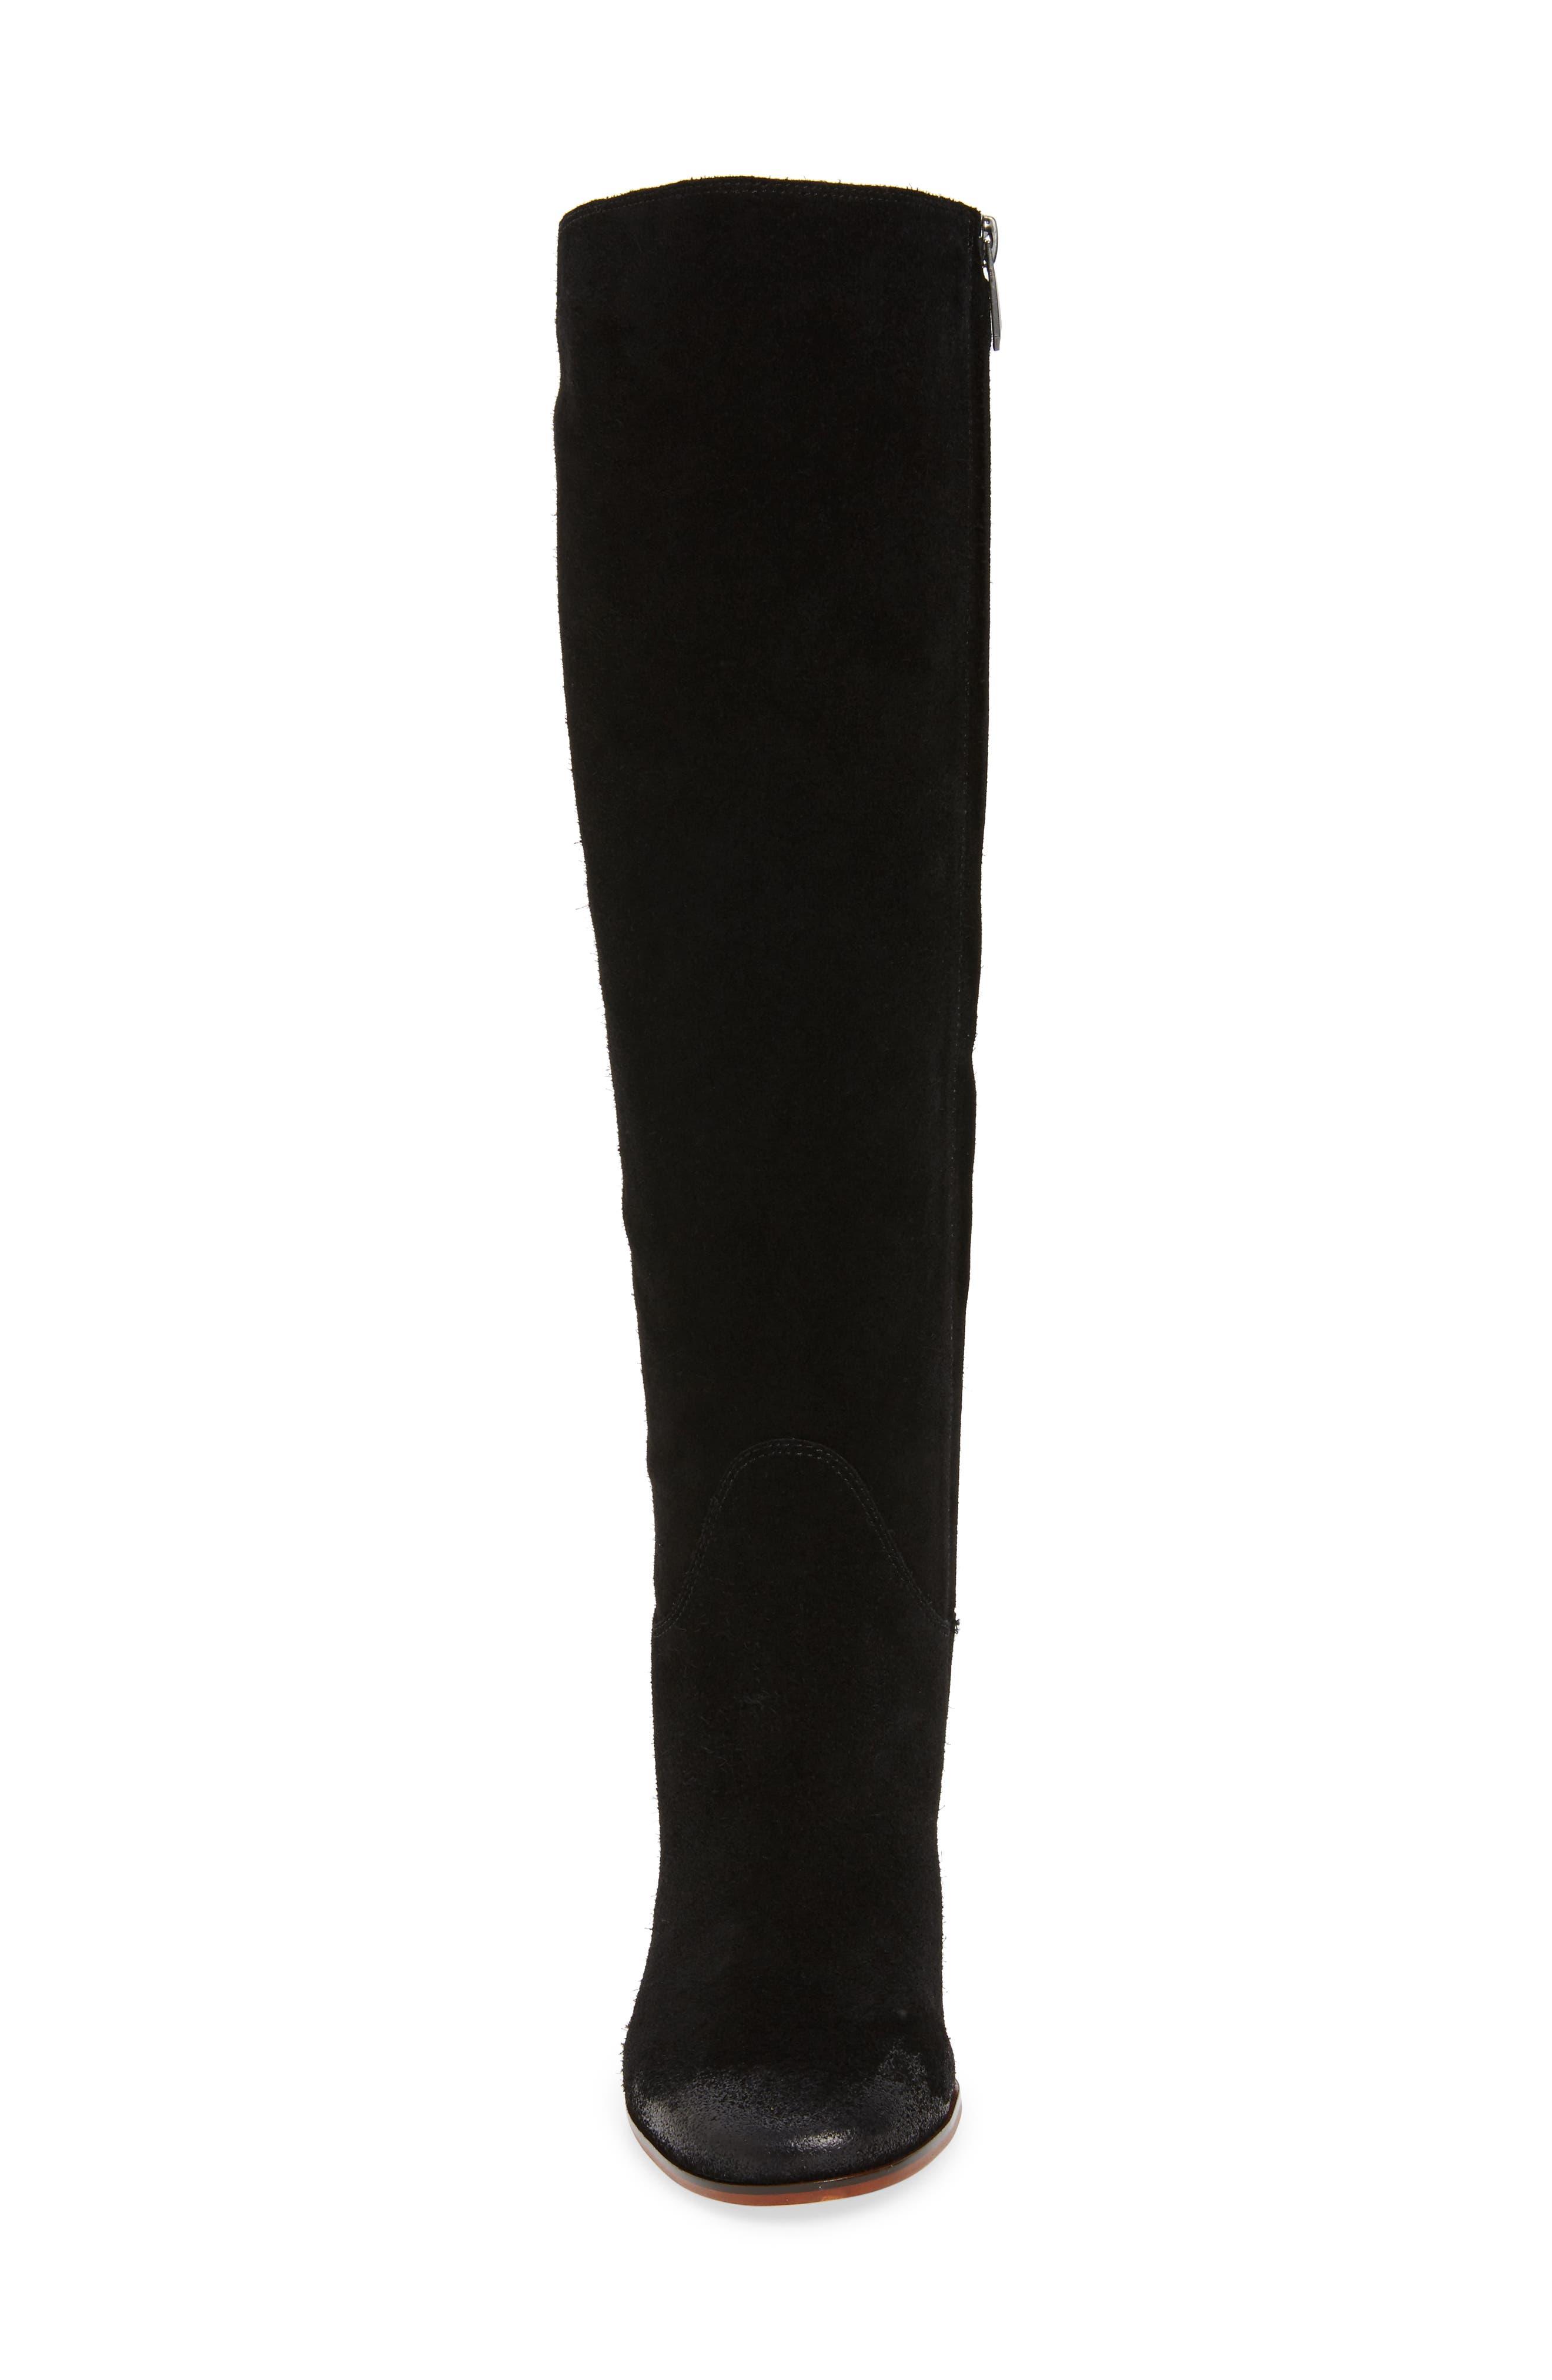 SAM EDELMAN, Camellia Tall Boot, Alternate thumbnail 4, color, 002